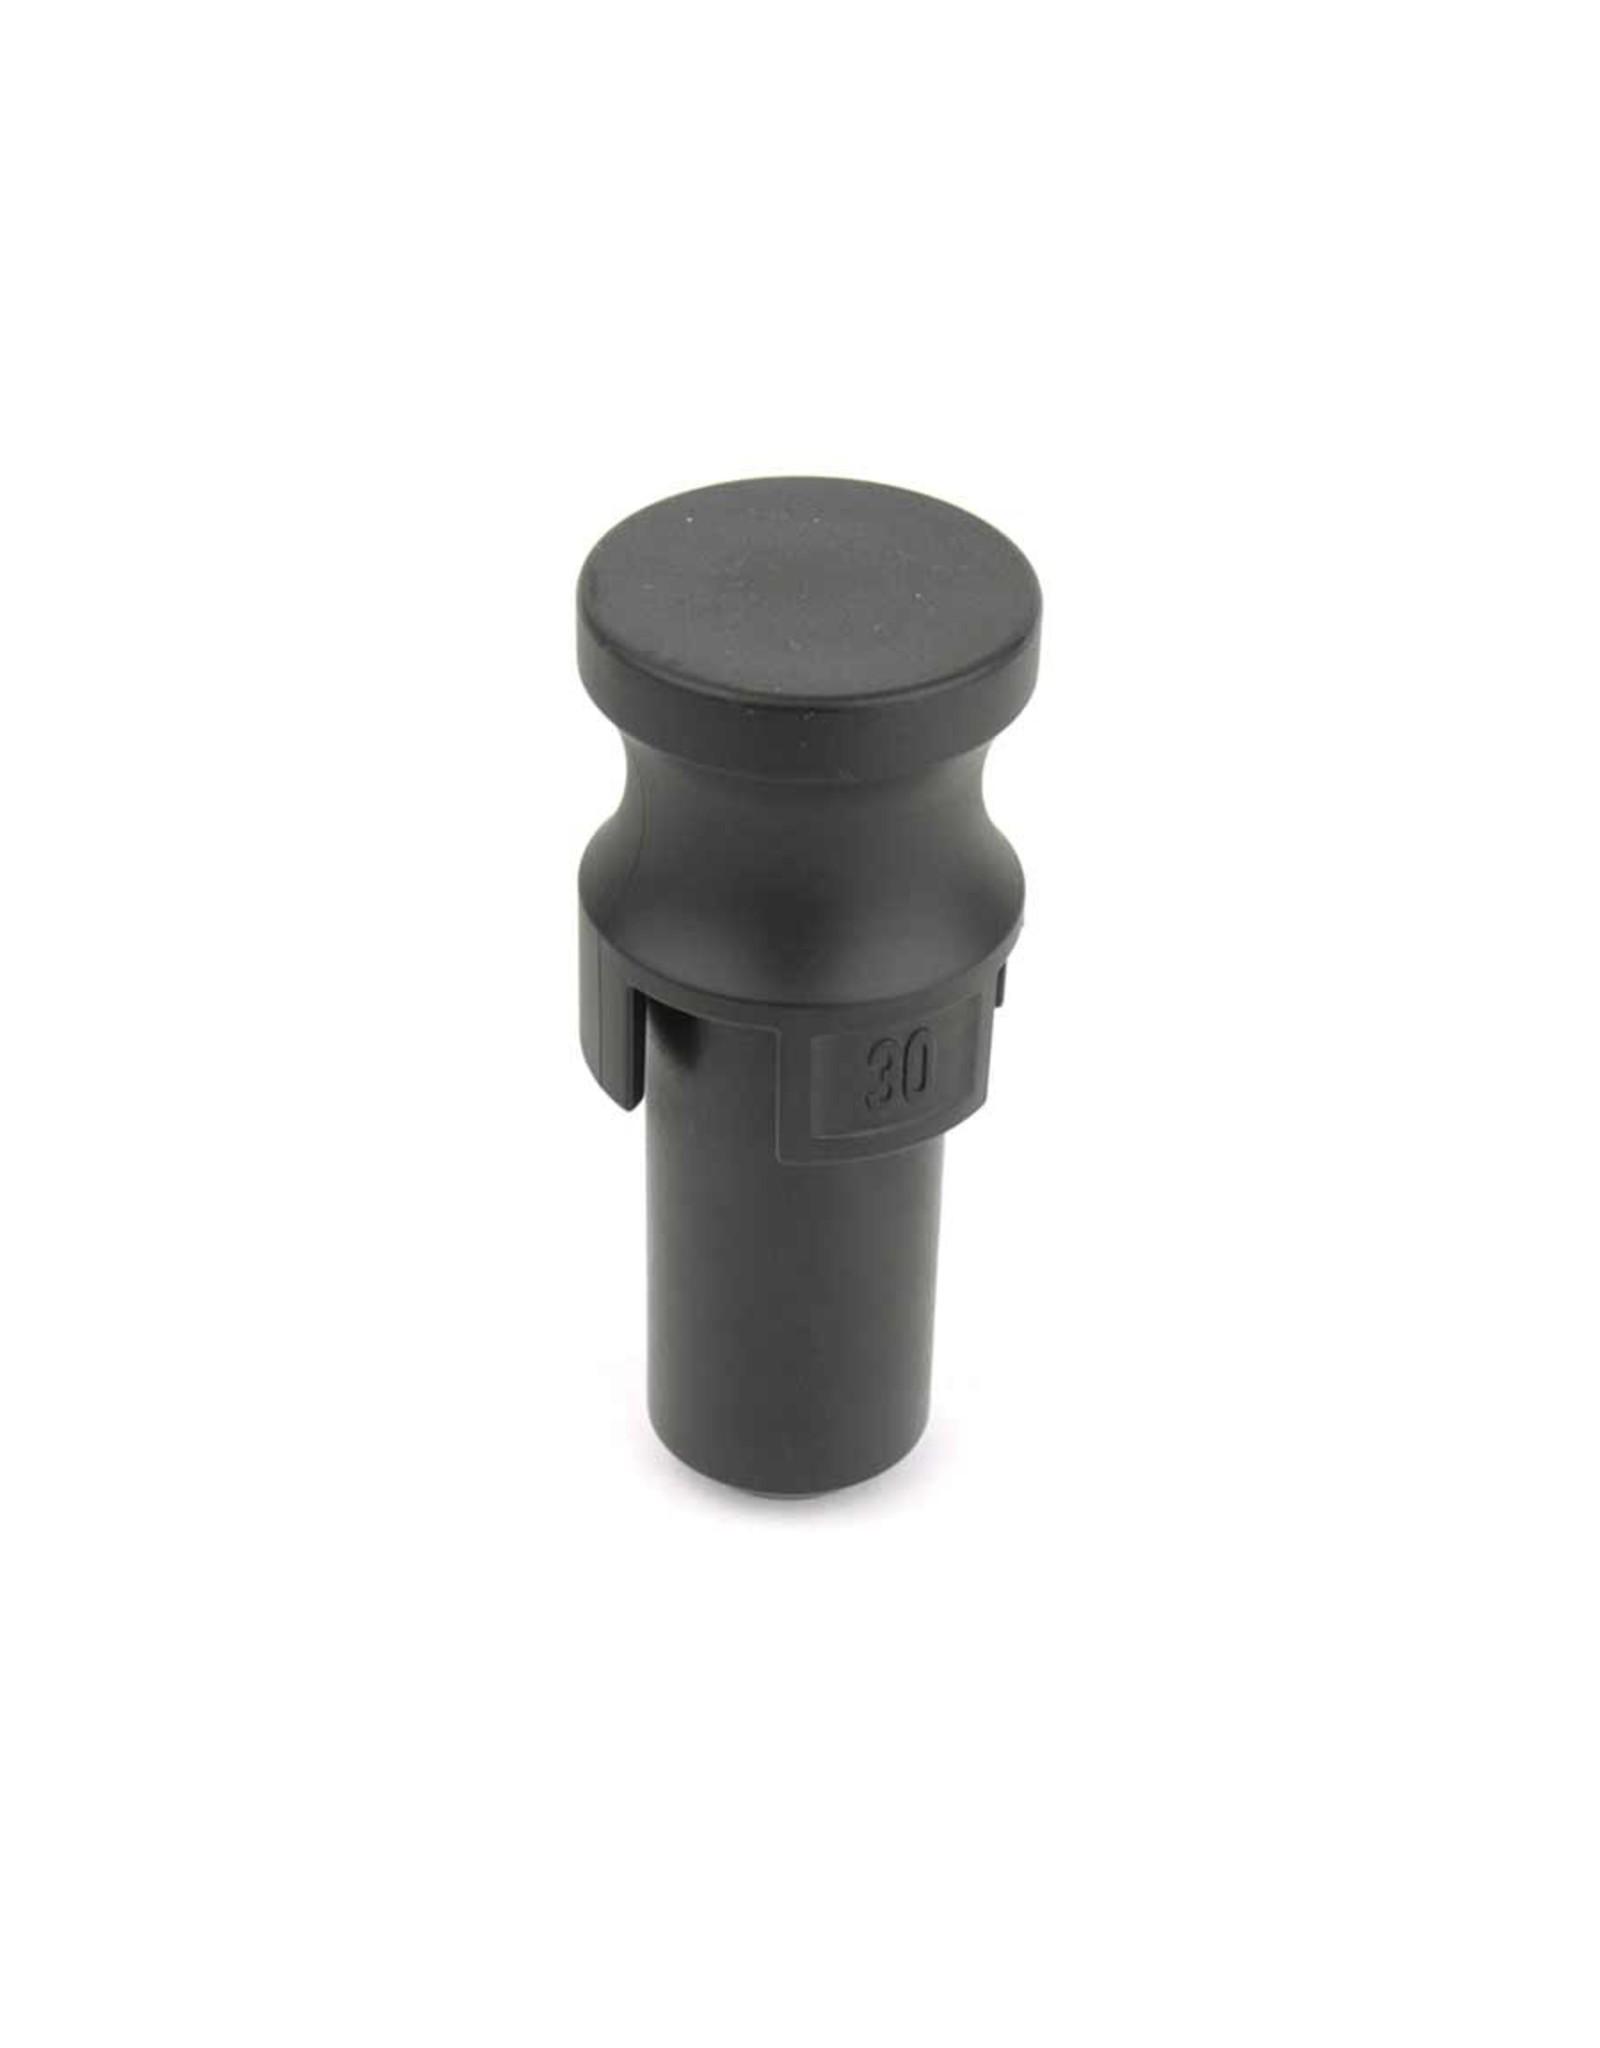 30mm Dust Seal Installation Tool